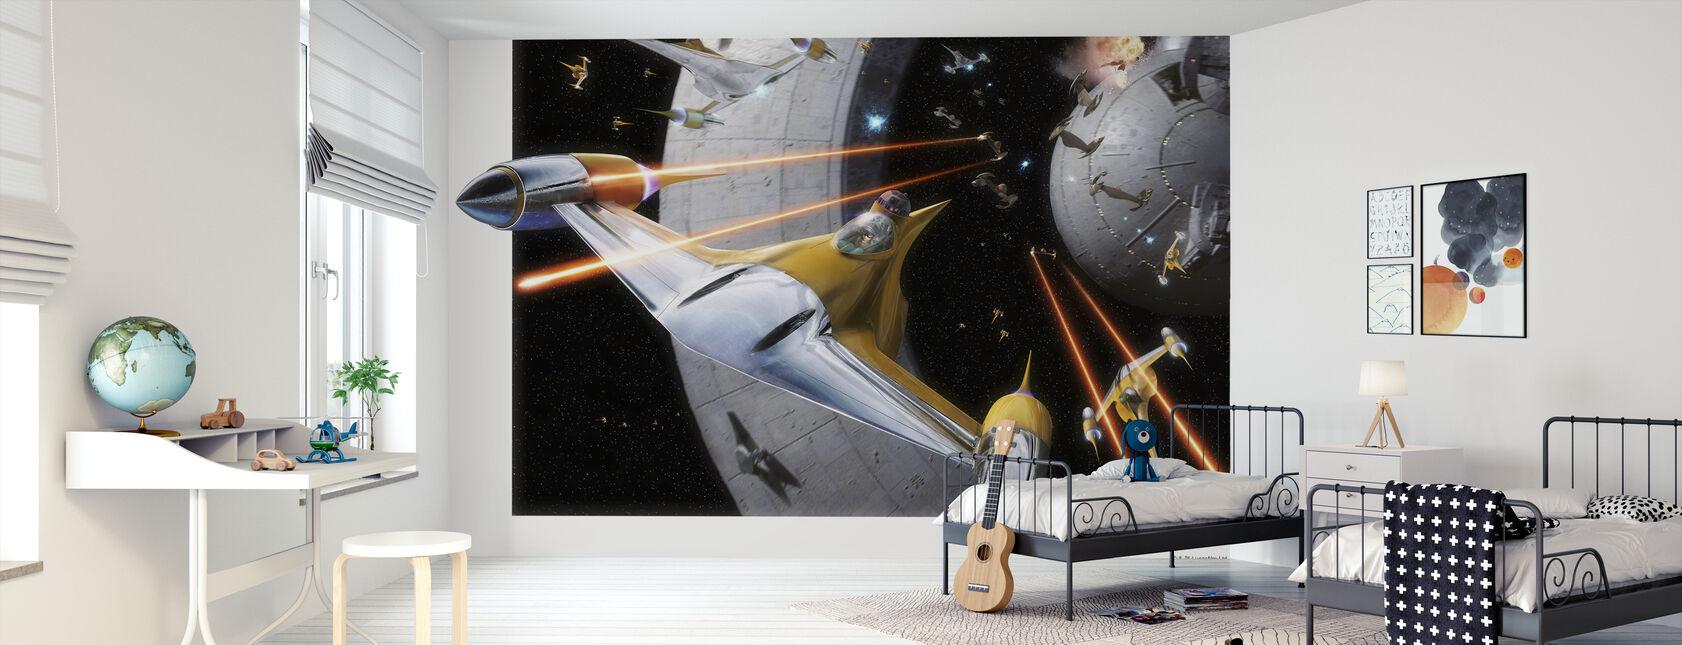 Star Wars - Anakin i Naboo Starfighter - Tapet - Barnerom